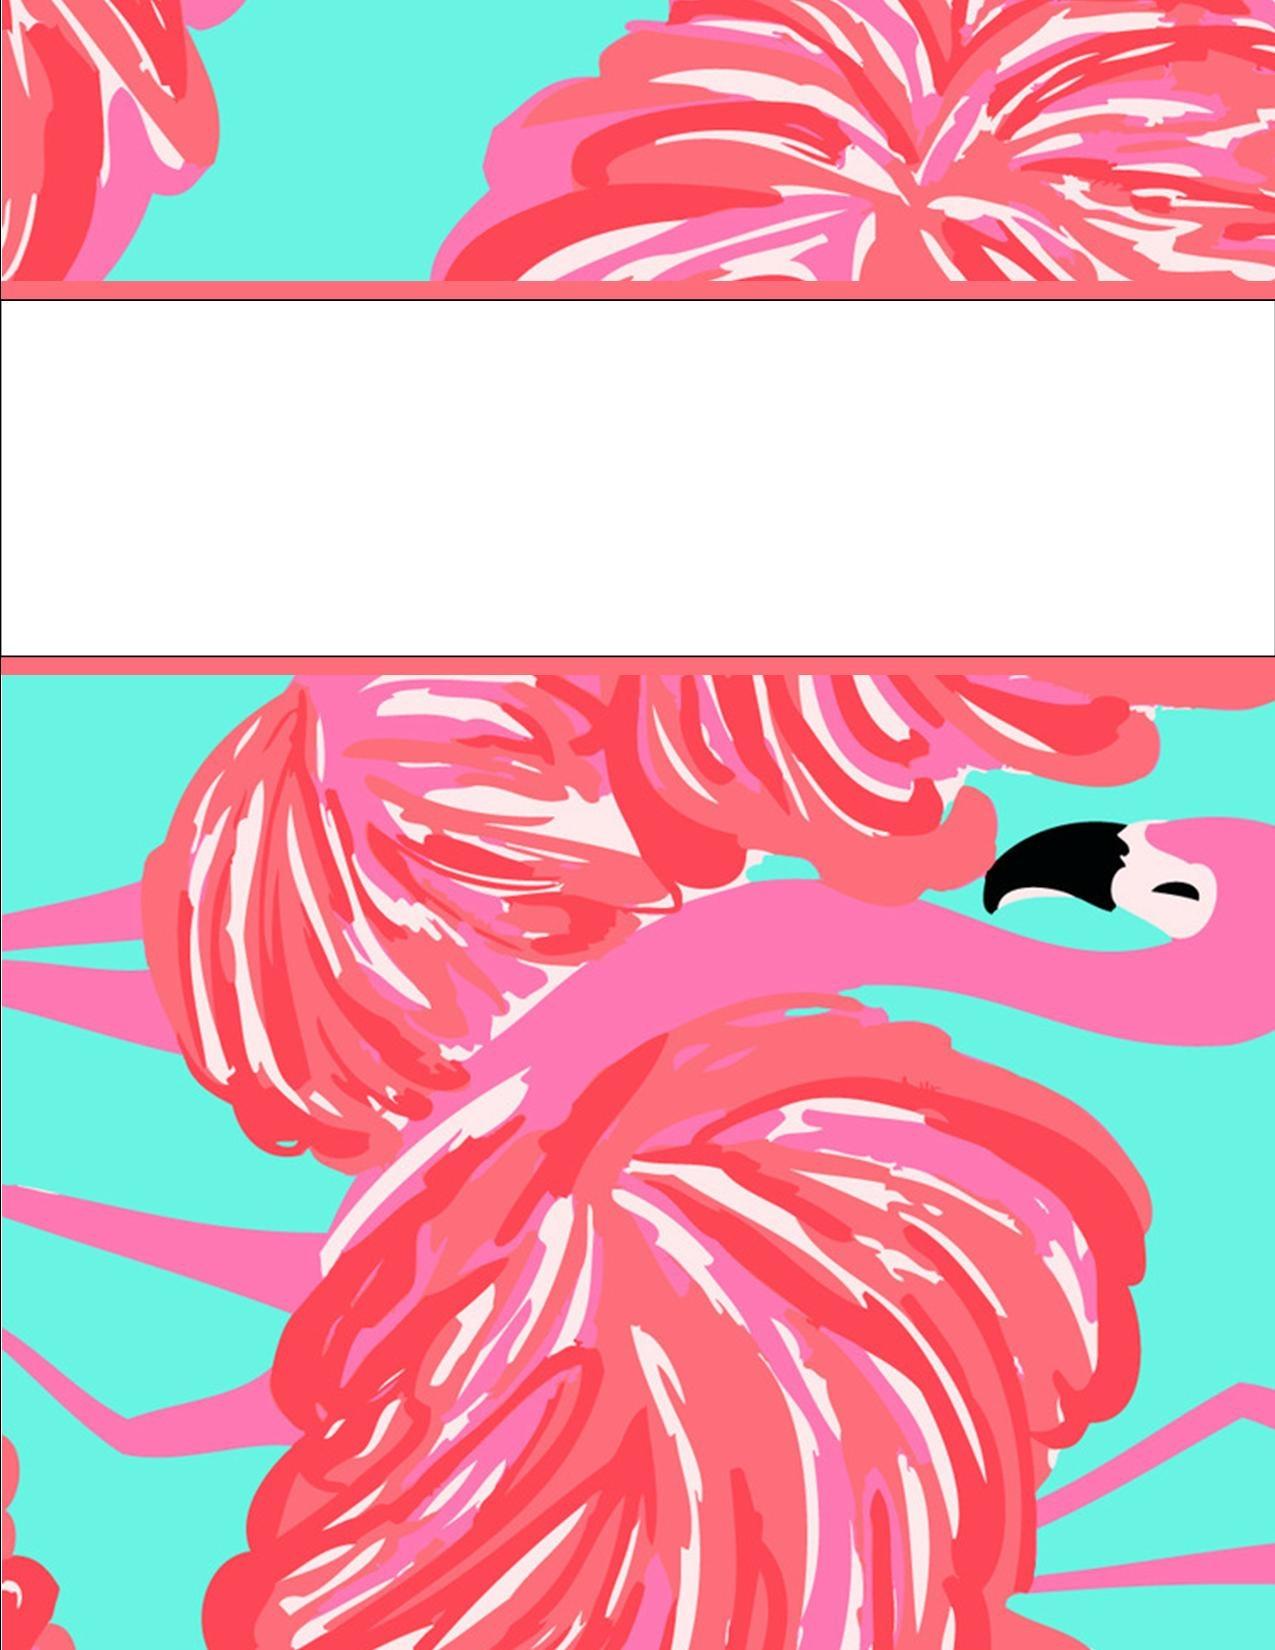 My Cute Binder Covers   Happily Hope - Free Printable Binder Covers